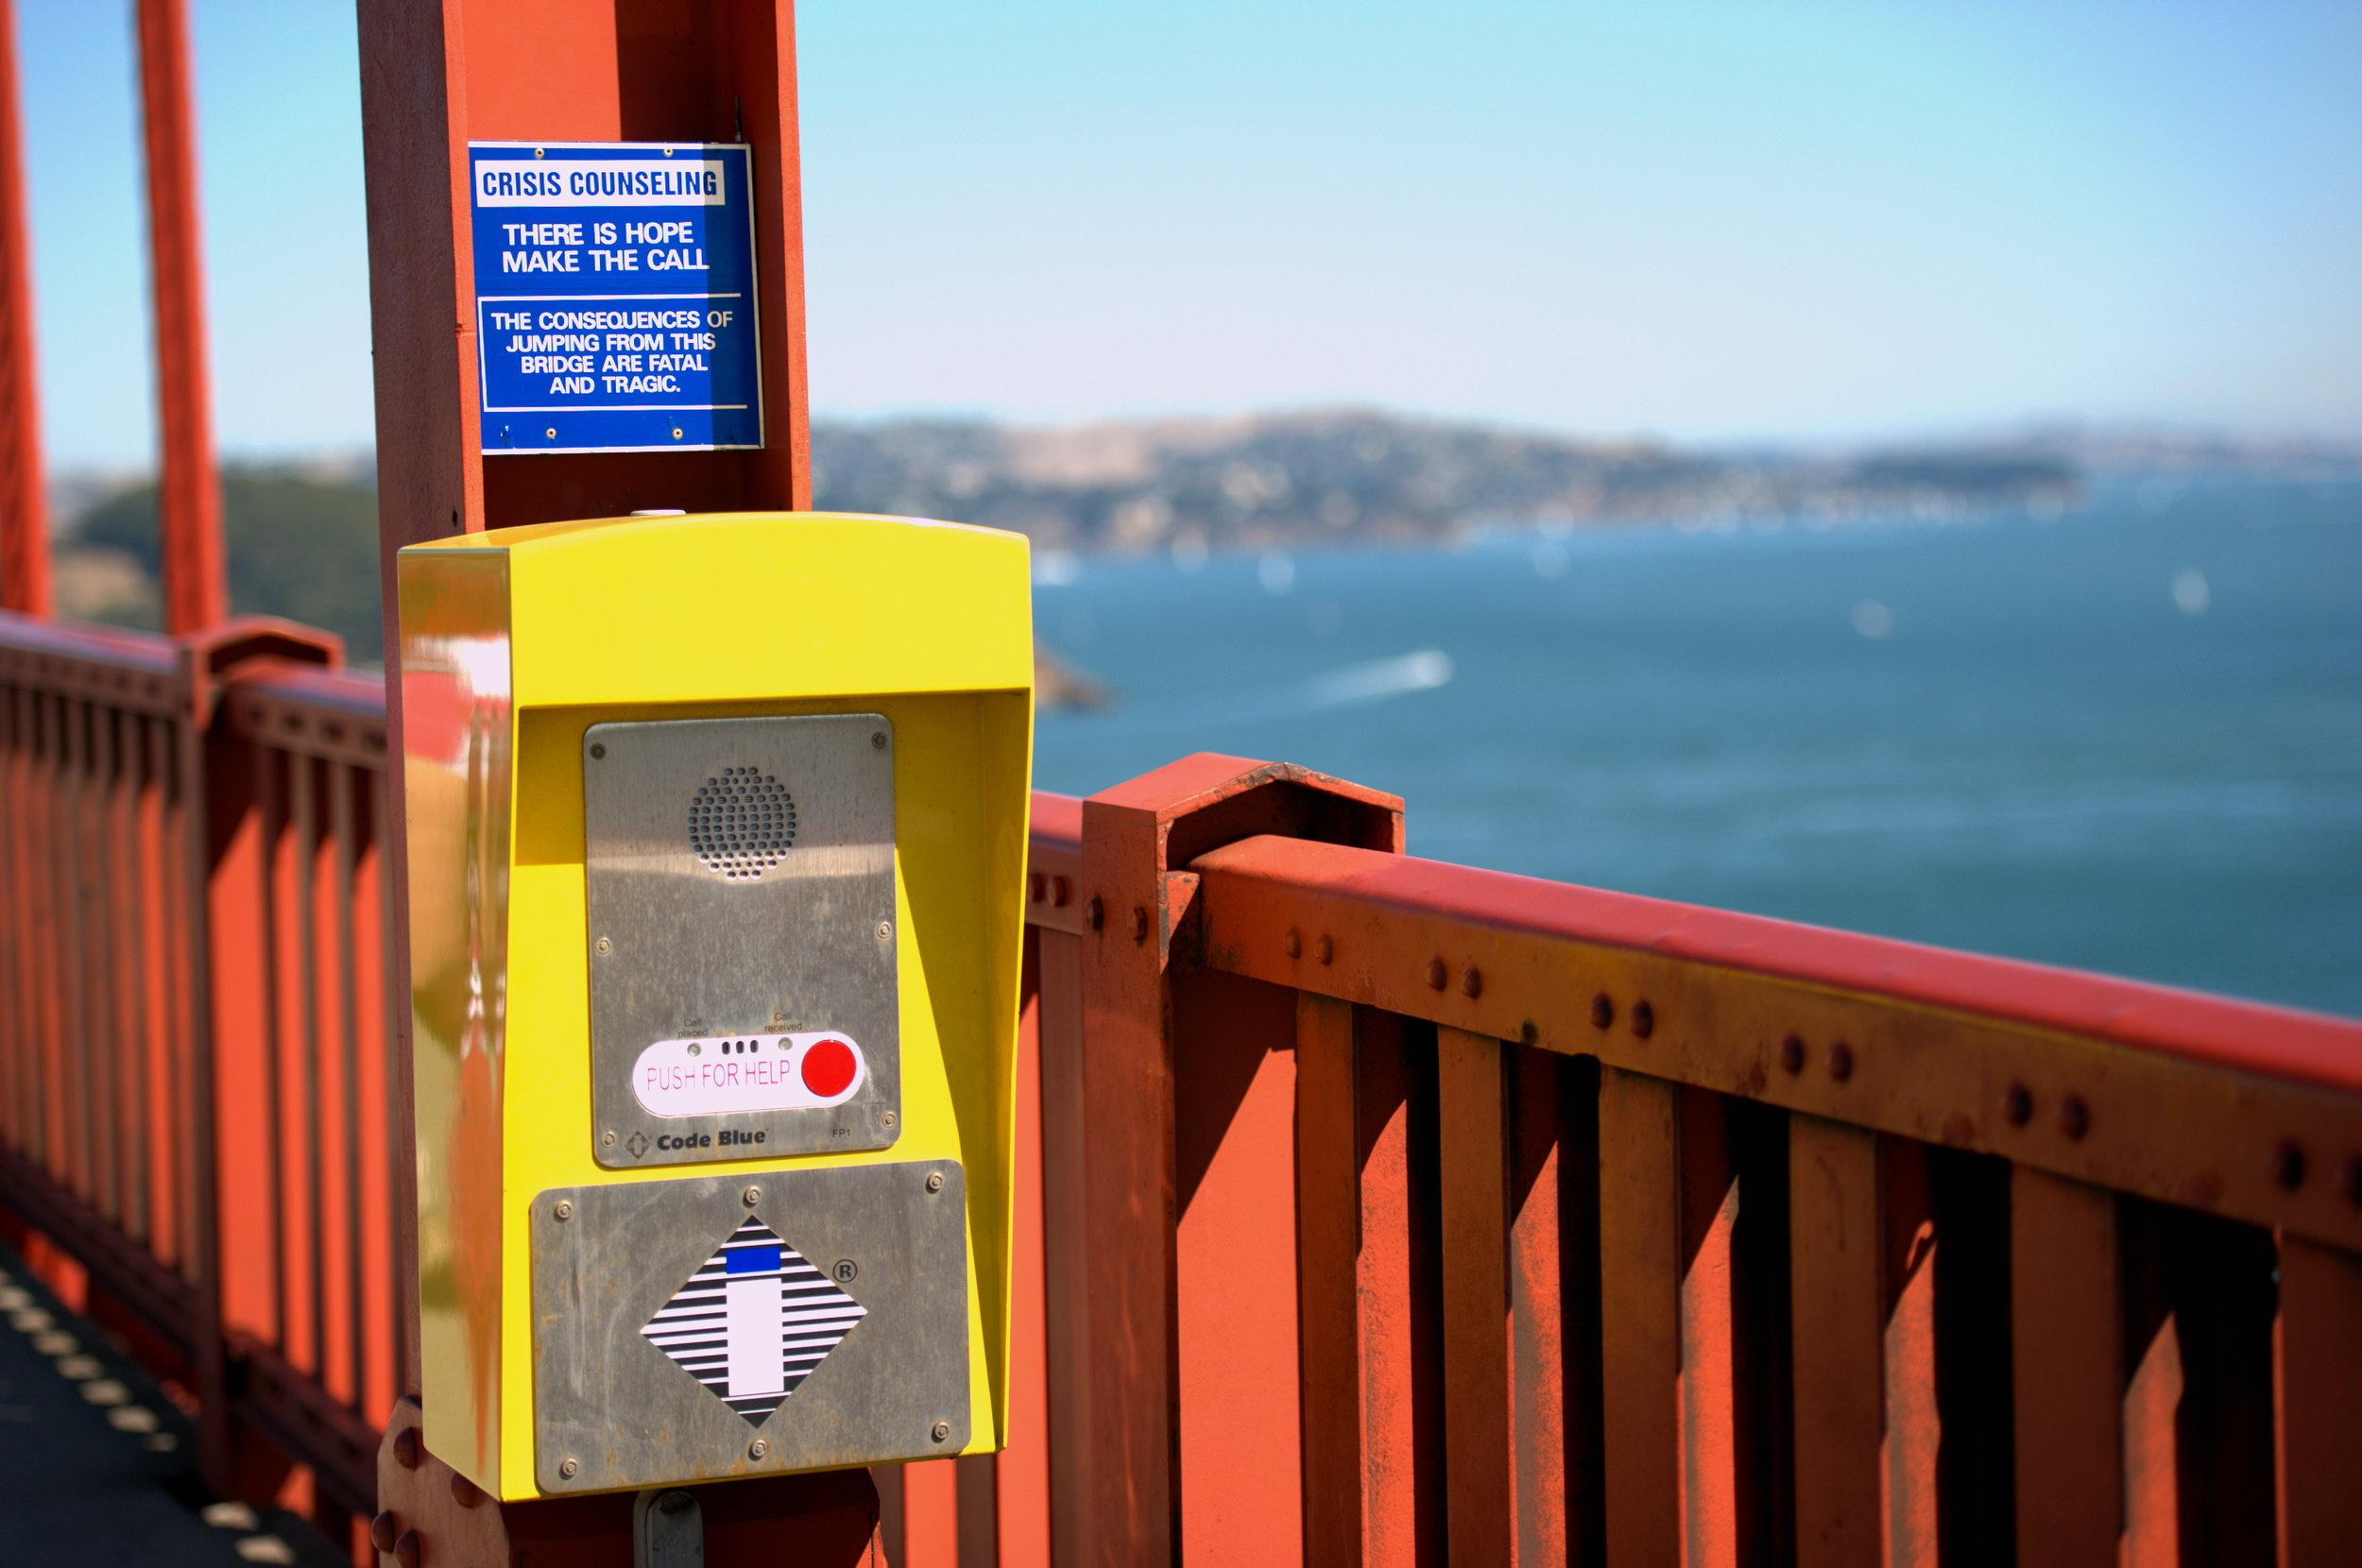 Suicide Phone Golden Gate